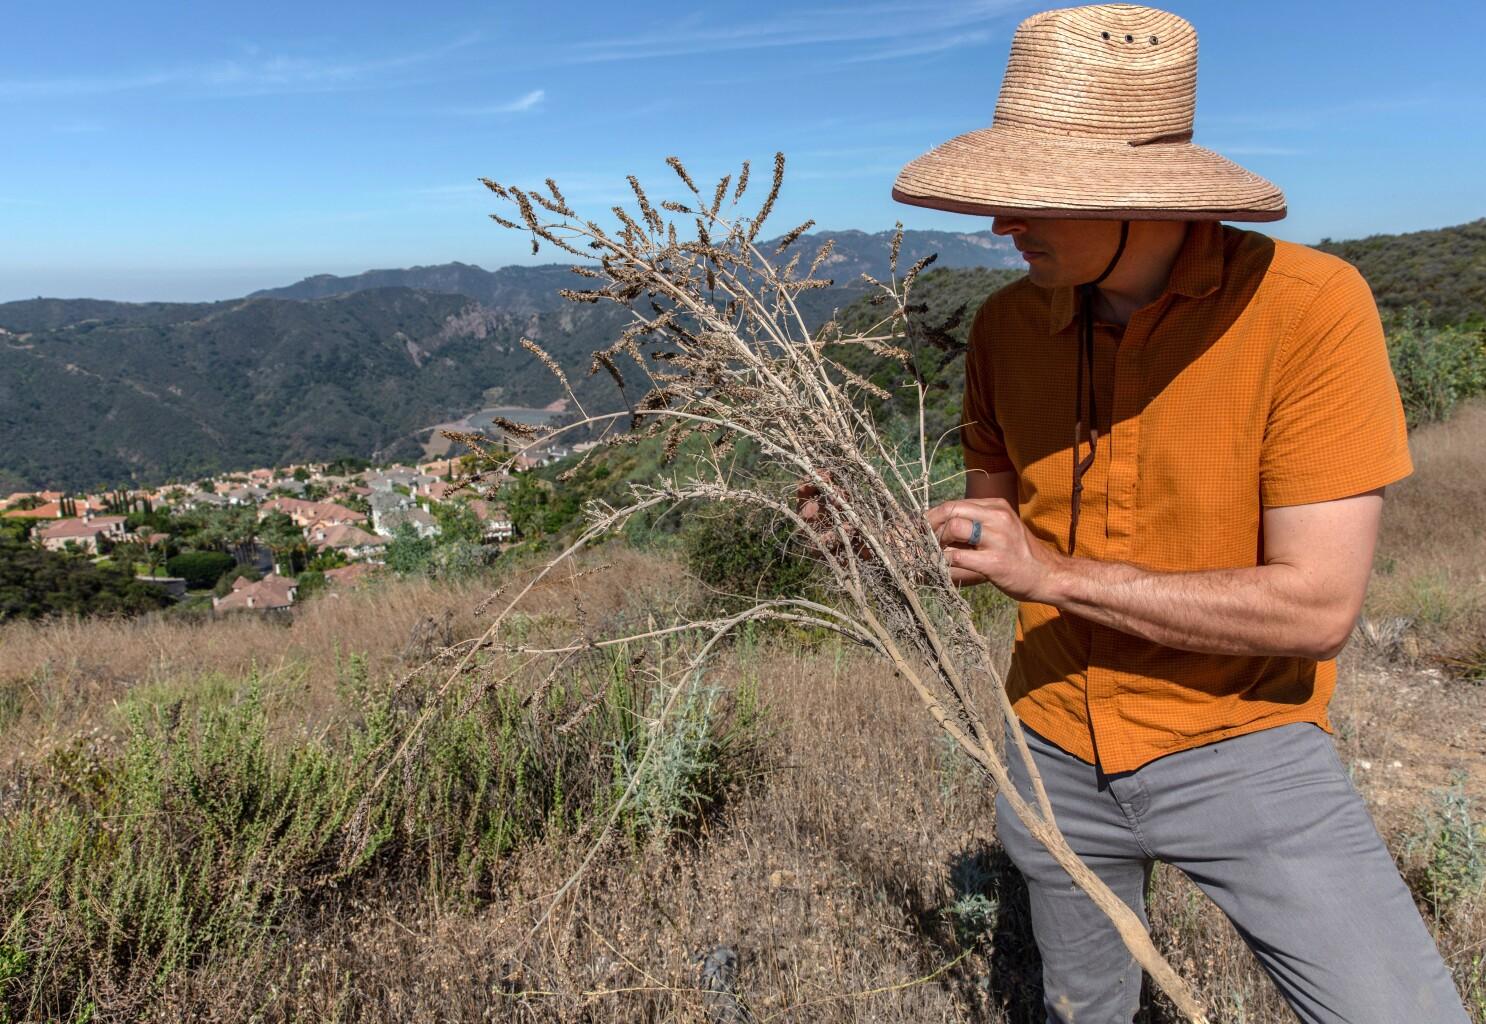 Los Angeles bulldozed endangered plants at Topanga State Park